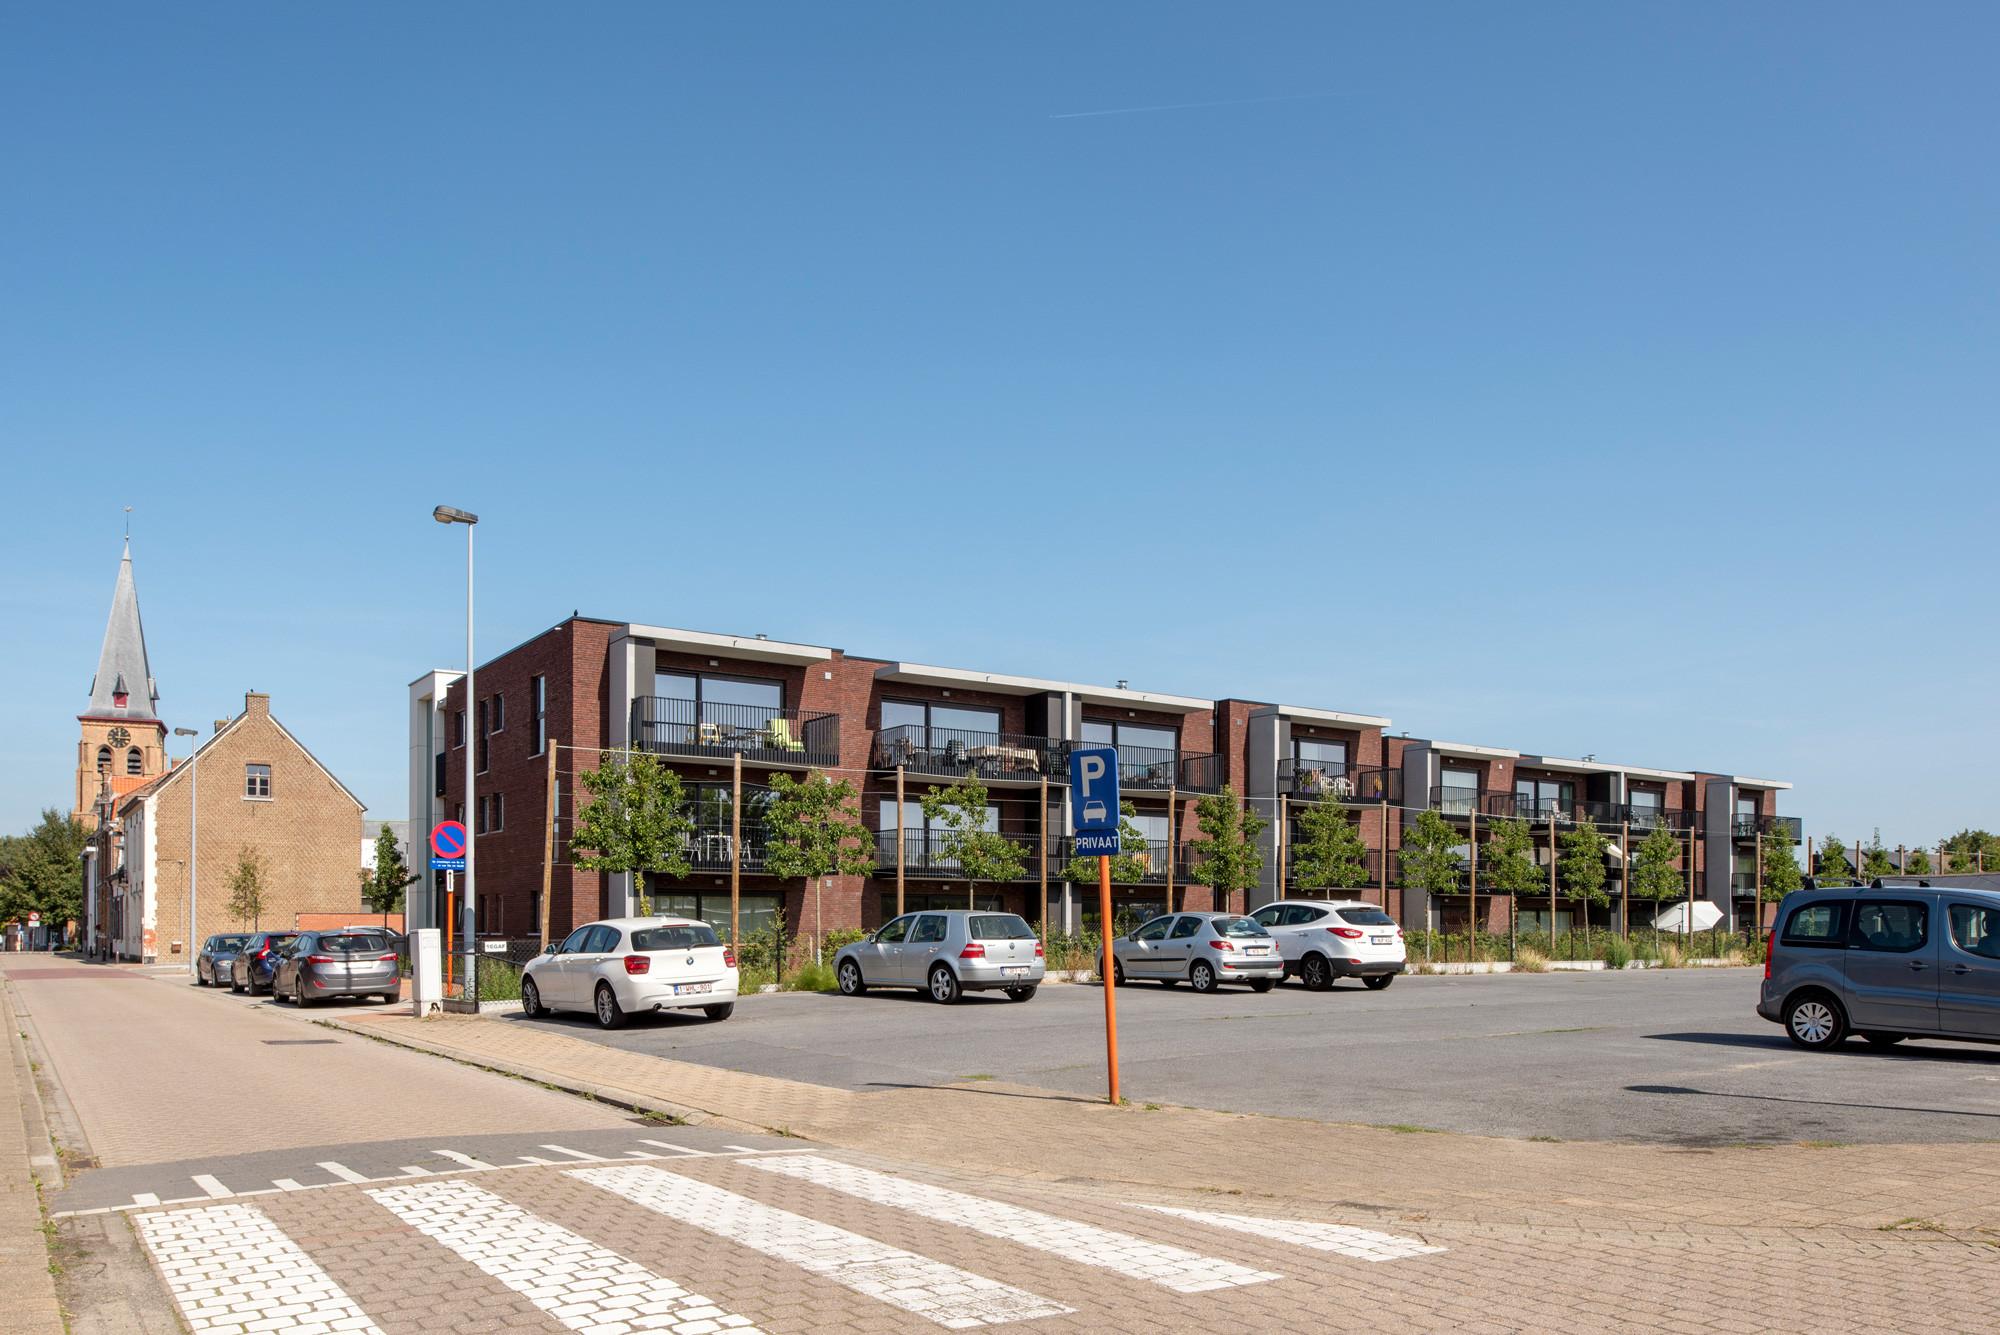 Meergezinswoning-Beernem-Claeys Architecten